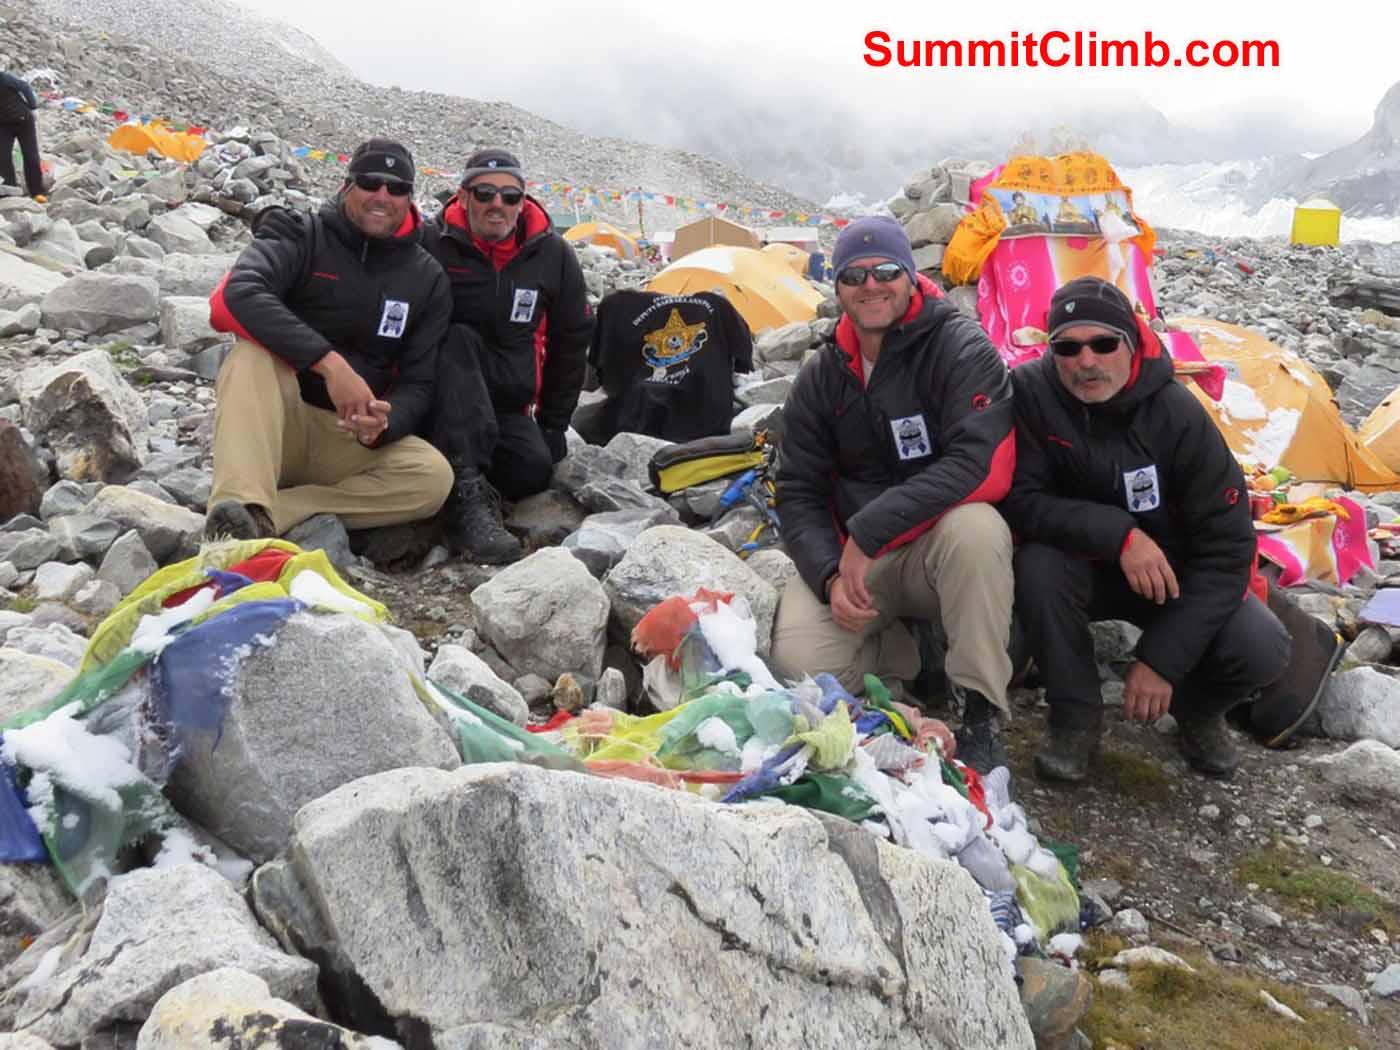 Cops on Top climbers Steve Janke, Stu Frink, Troy Bacon and Kaley Erickson at Advance Base Camp by Kaley Erickson.